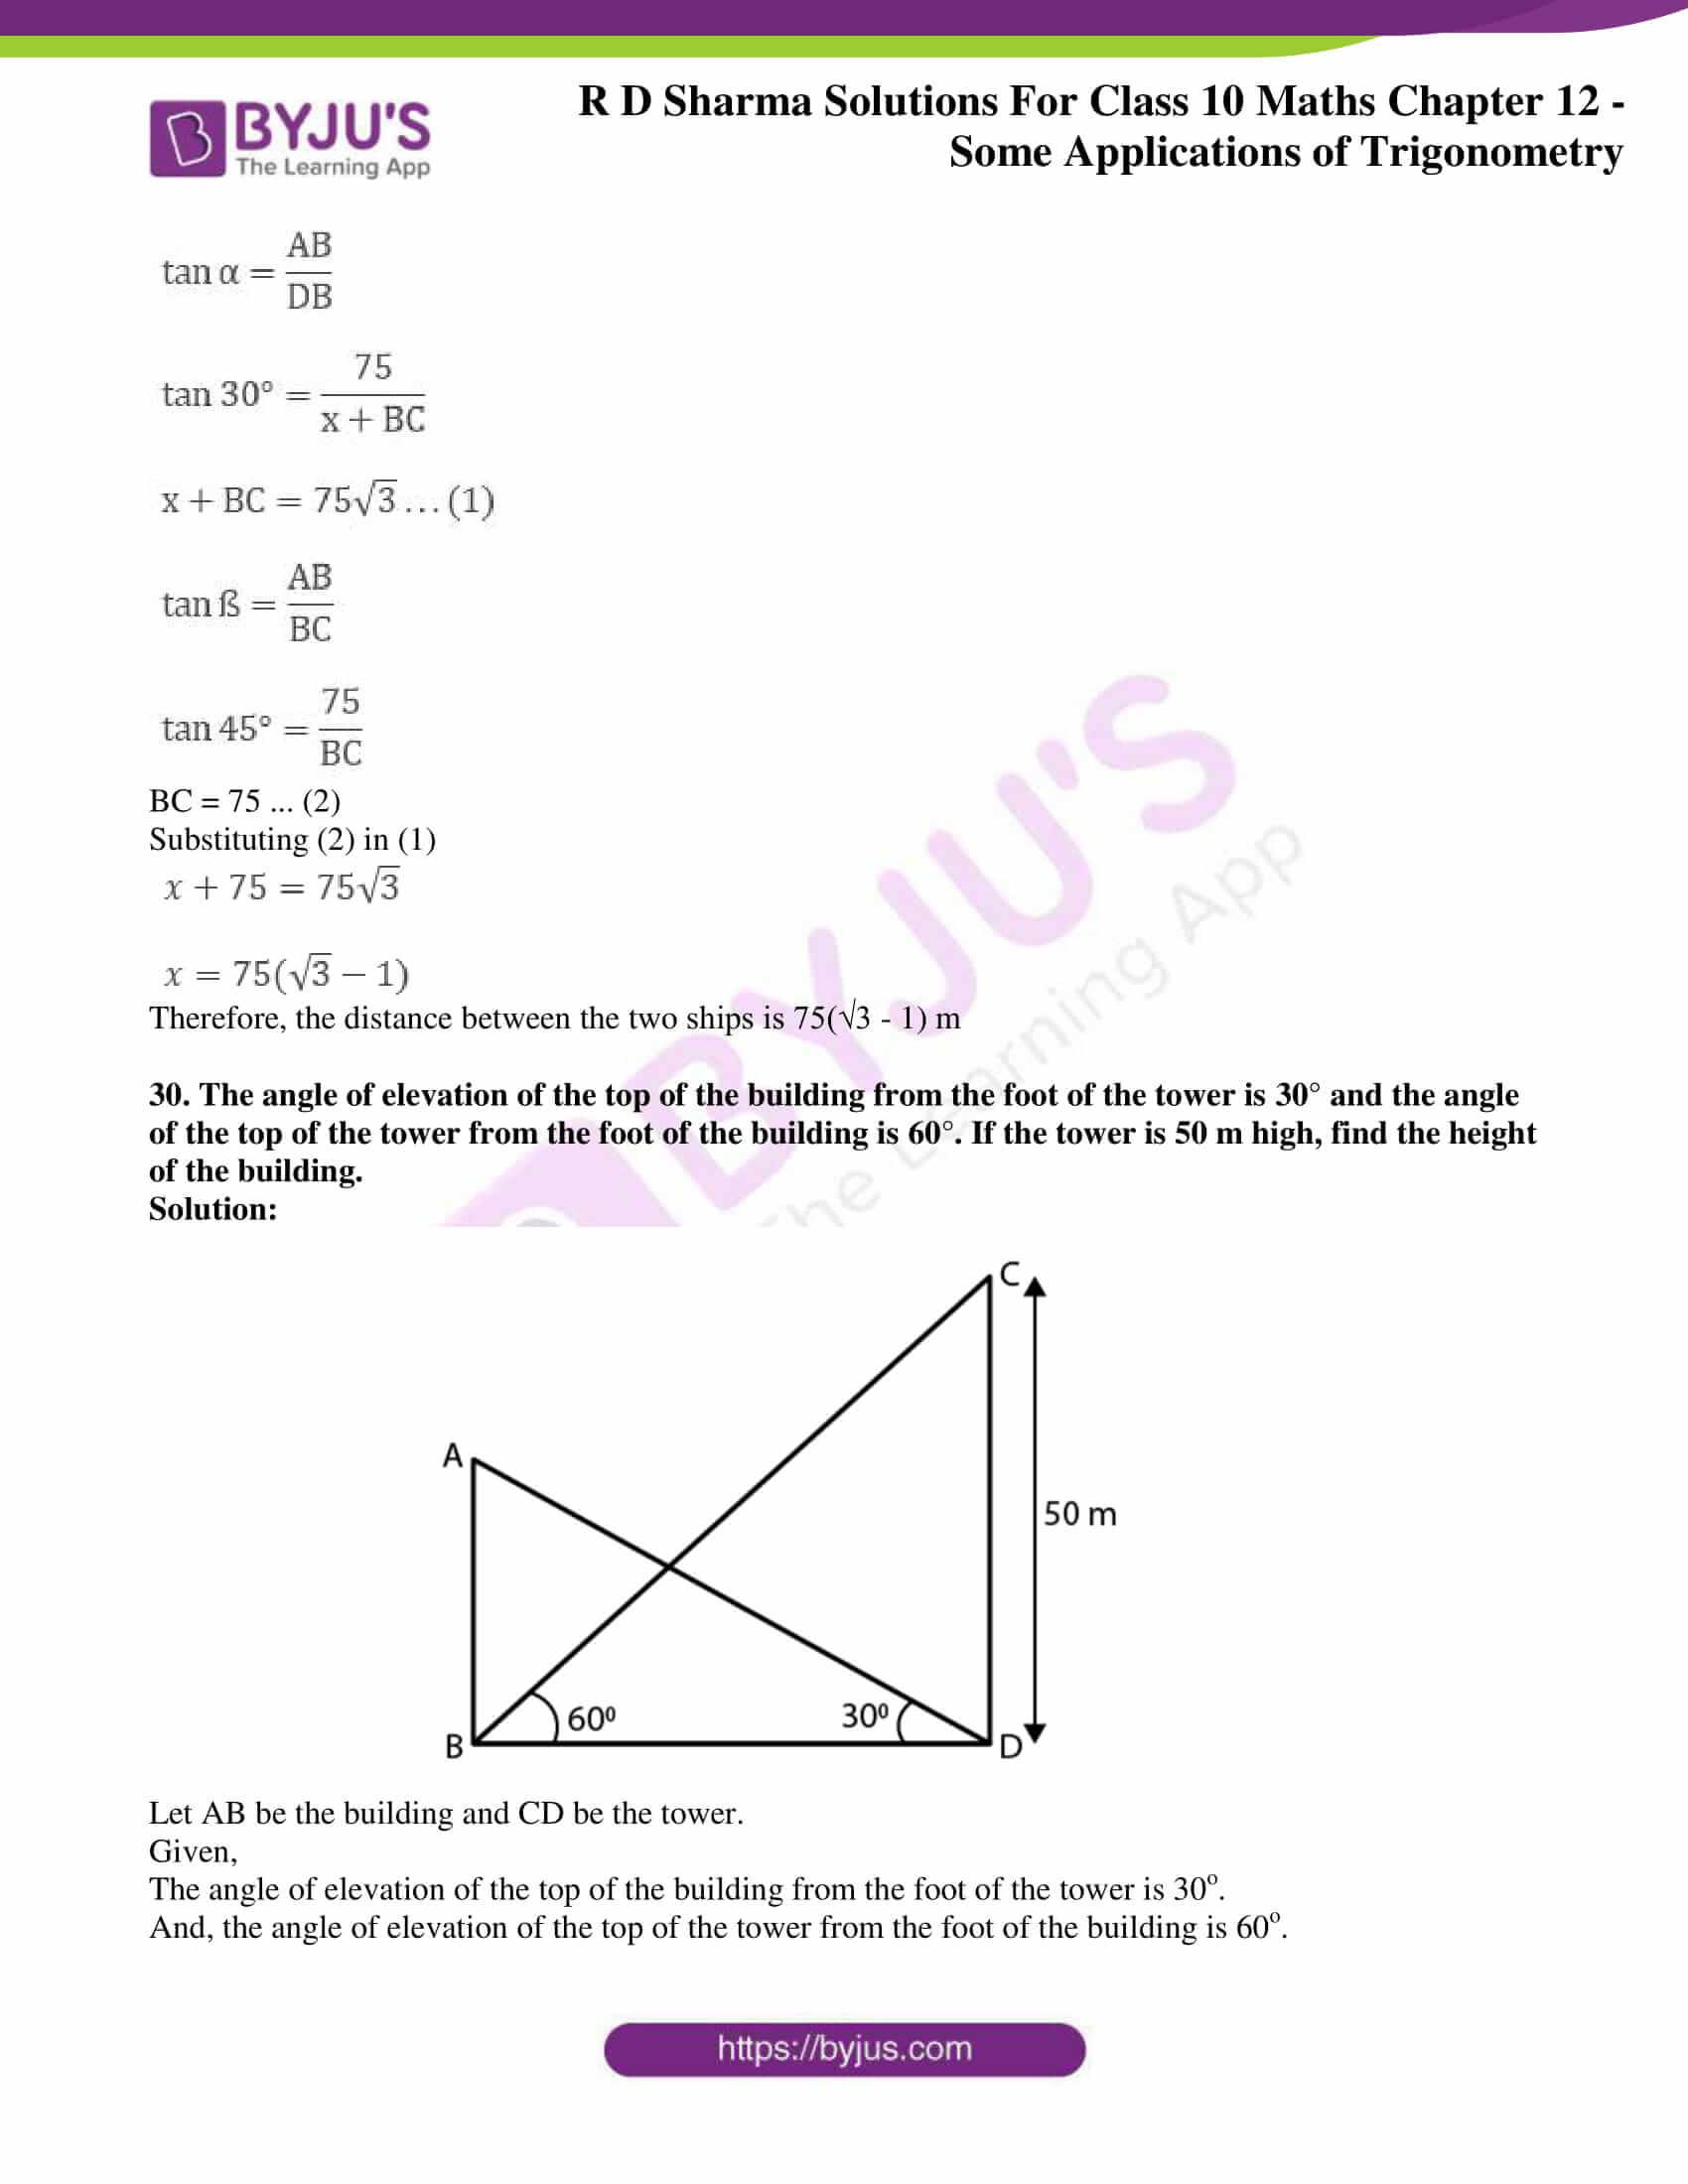 rd sharma class 10 chapter 12 applications trigonometry solutions 29